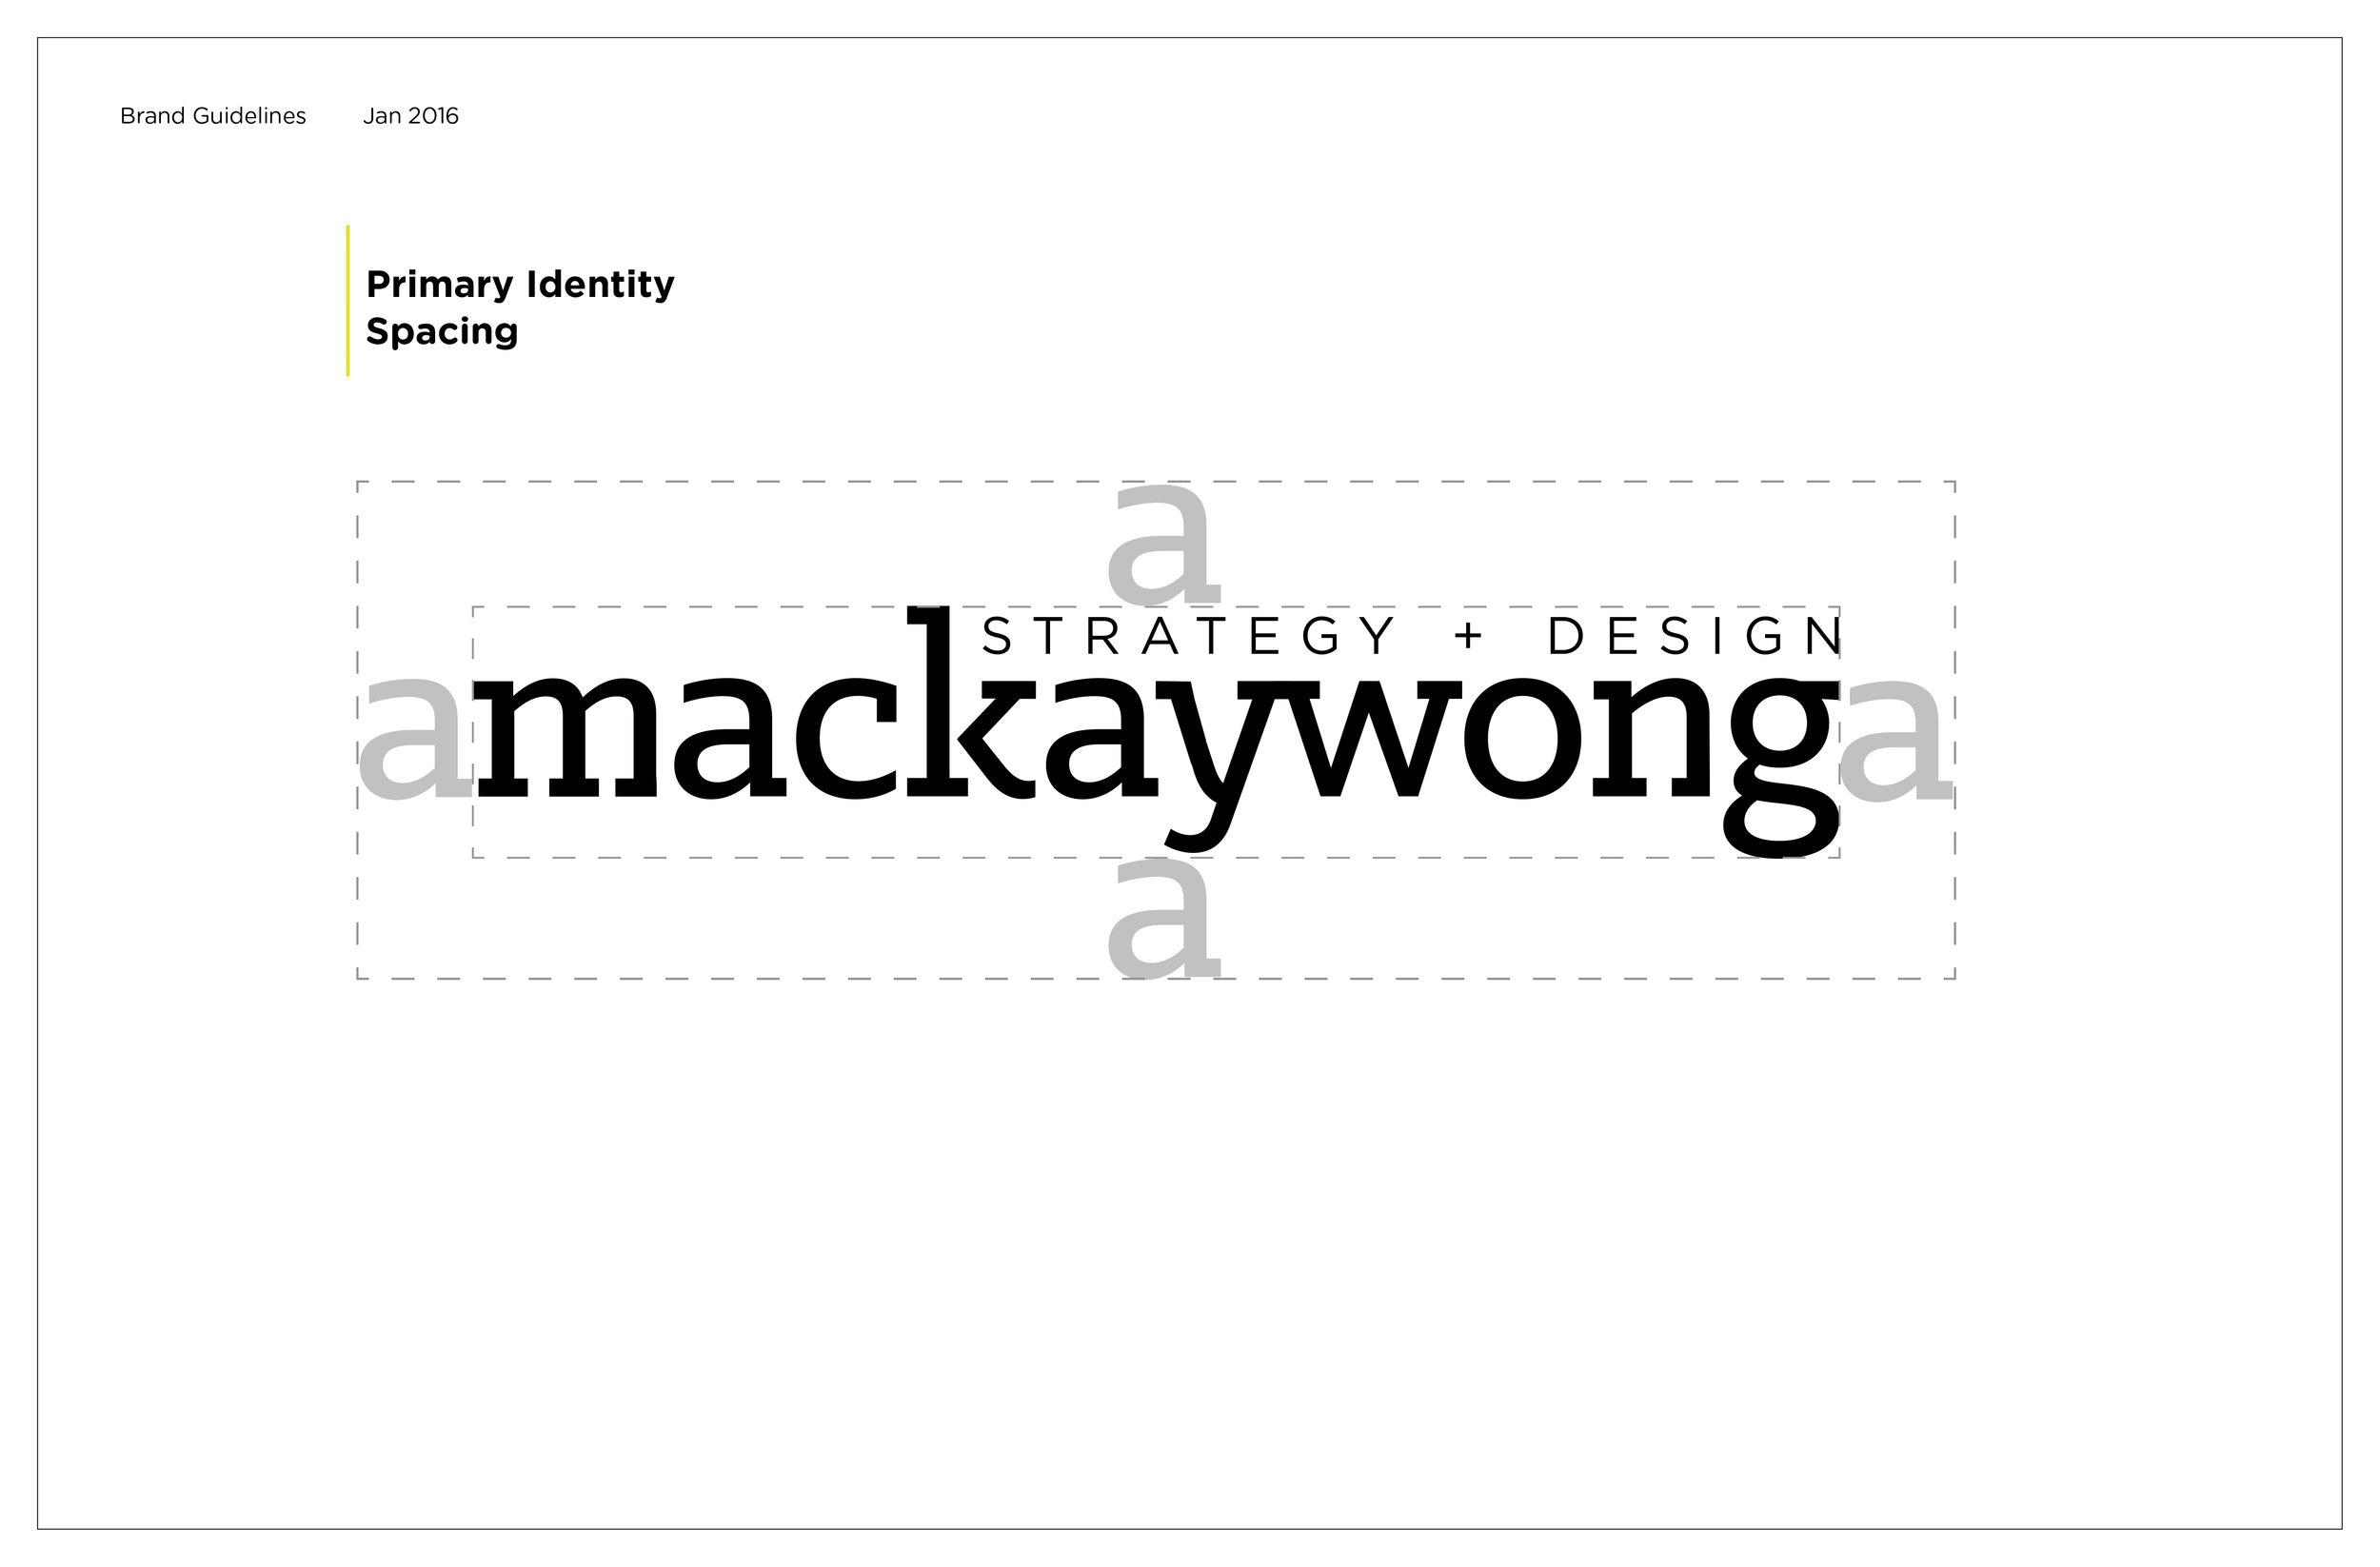 MW new brandstandards_logo-02.jpg